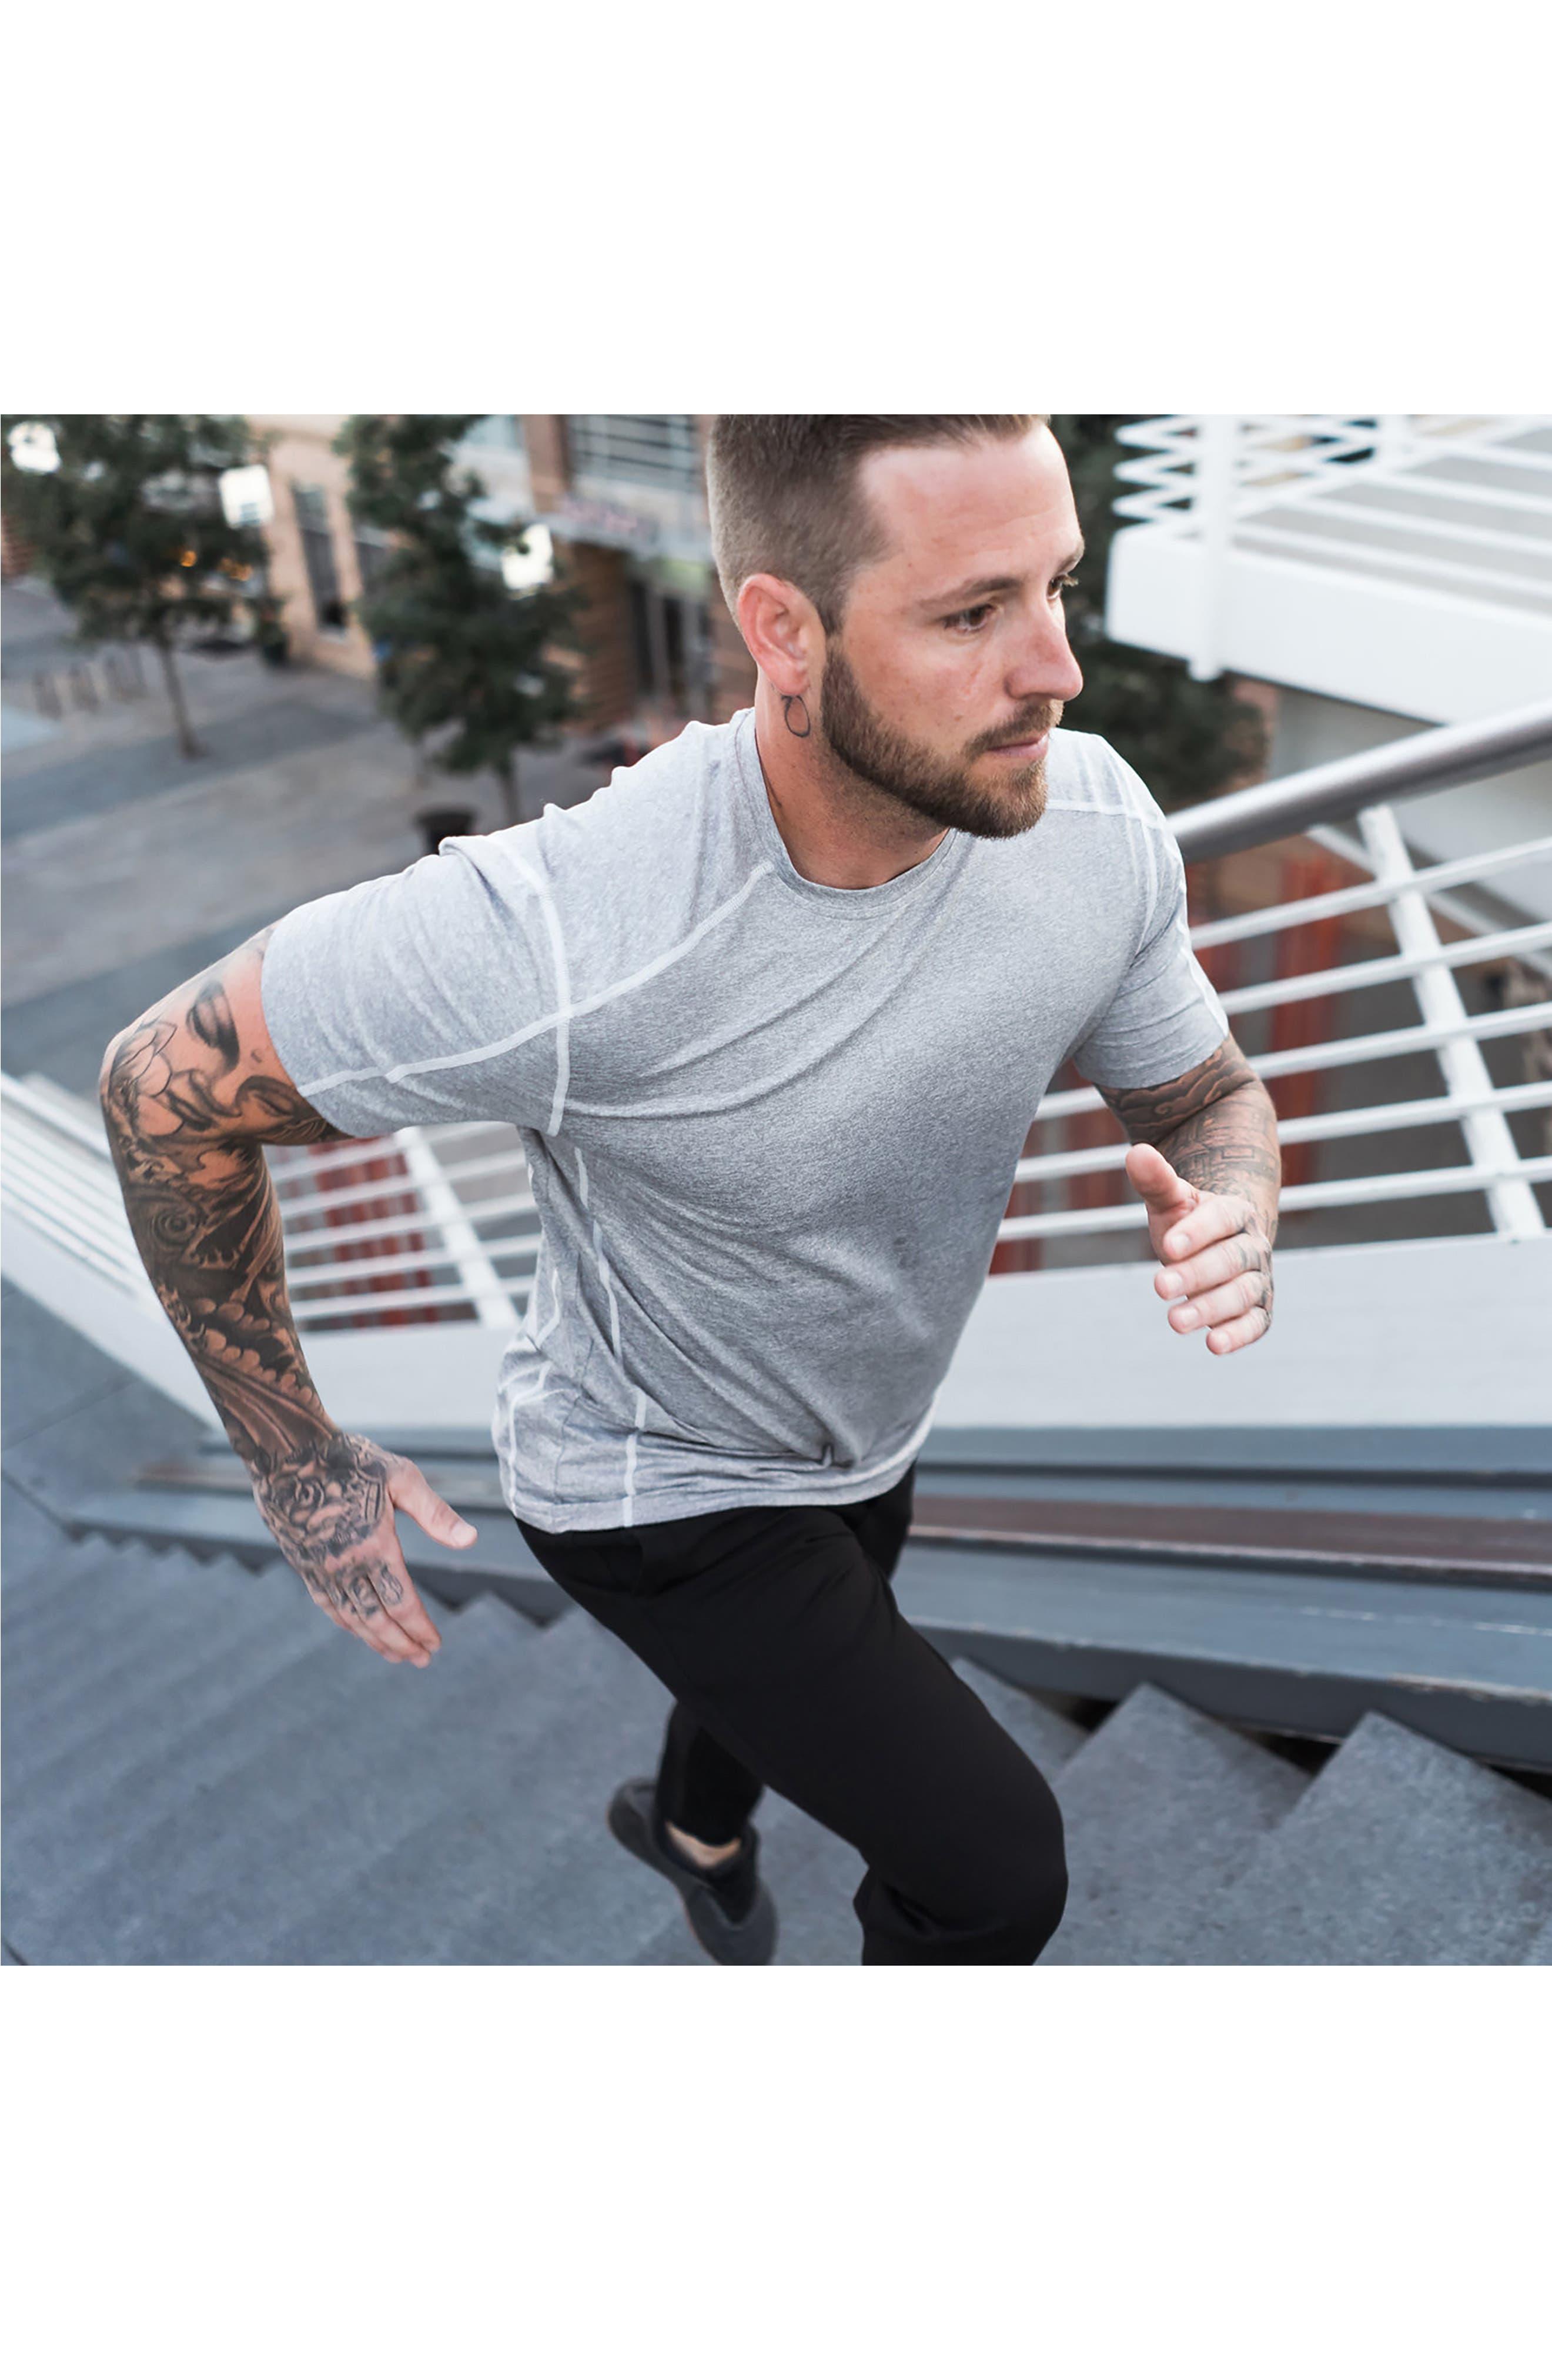 'Cooldown' Moisture Wicking Training T-Shirt,                             Alternate thumbnail 7, color,                             030